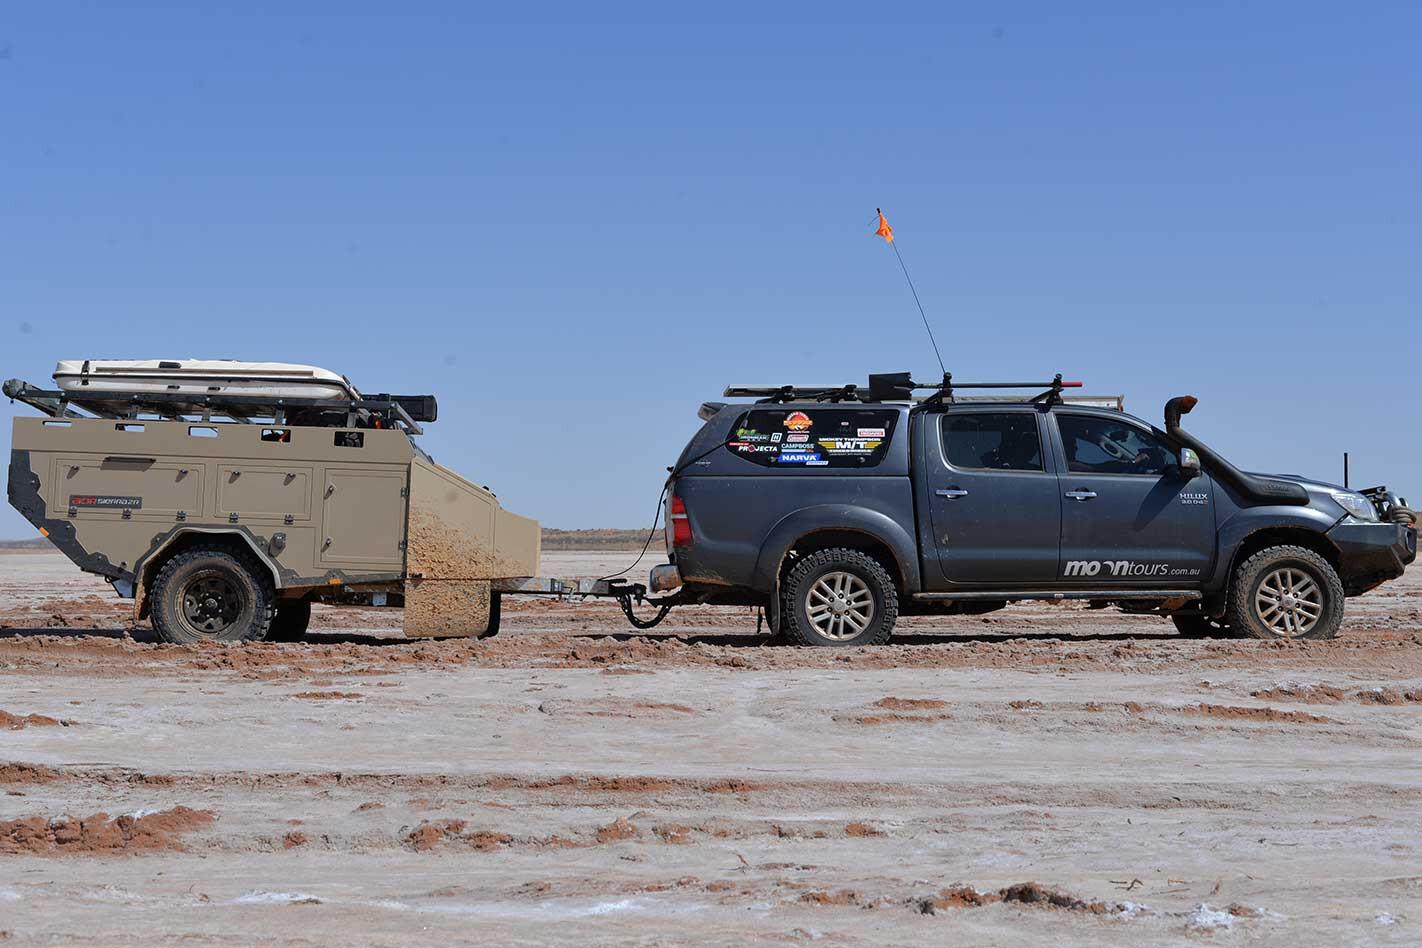 AOR Sierra ZR camper trailer